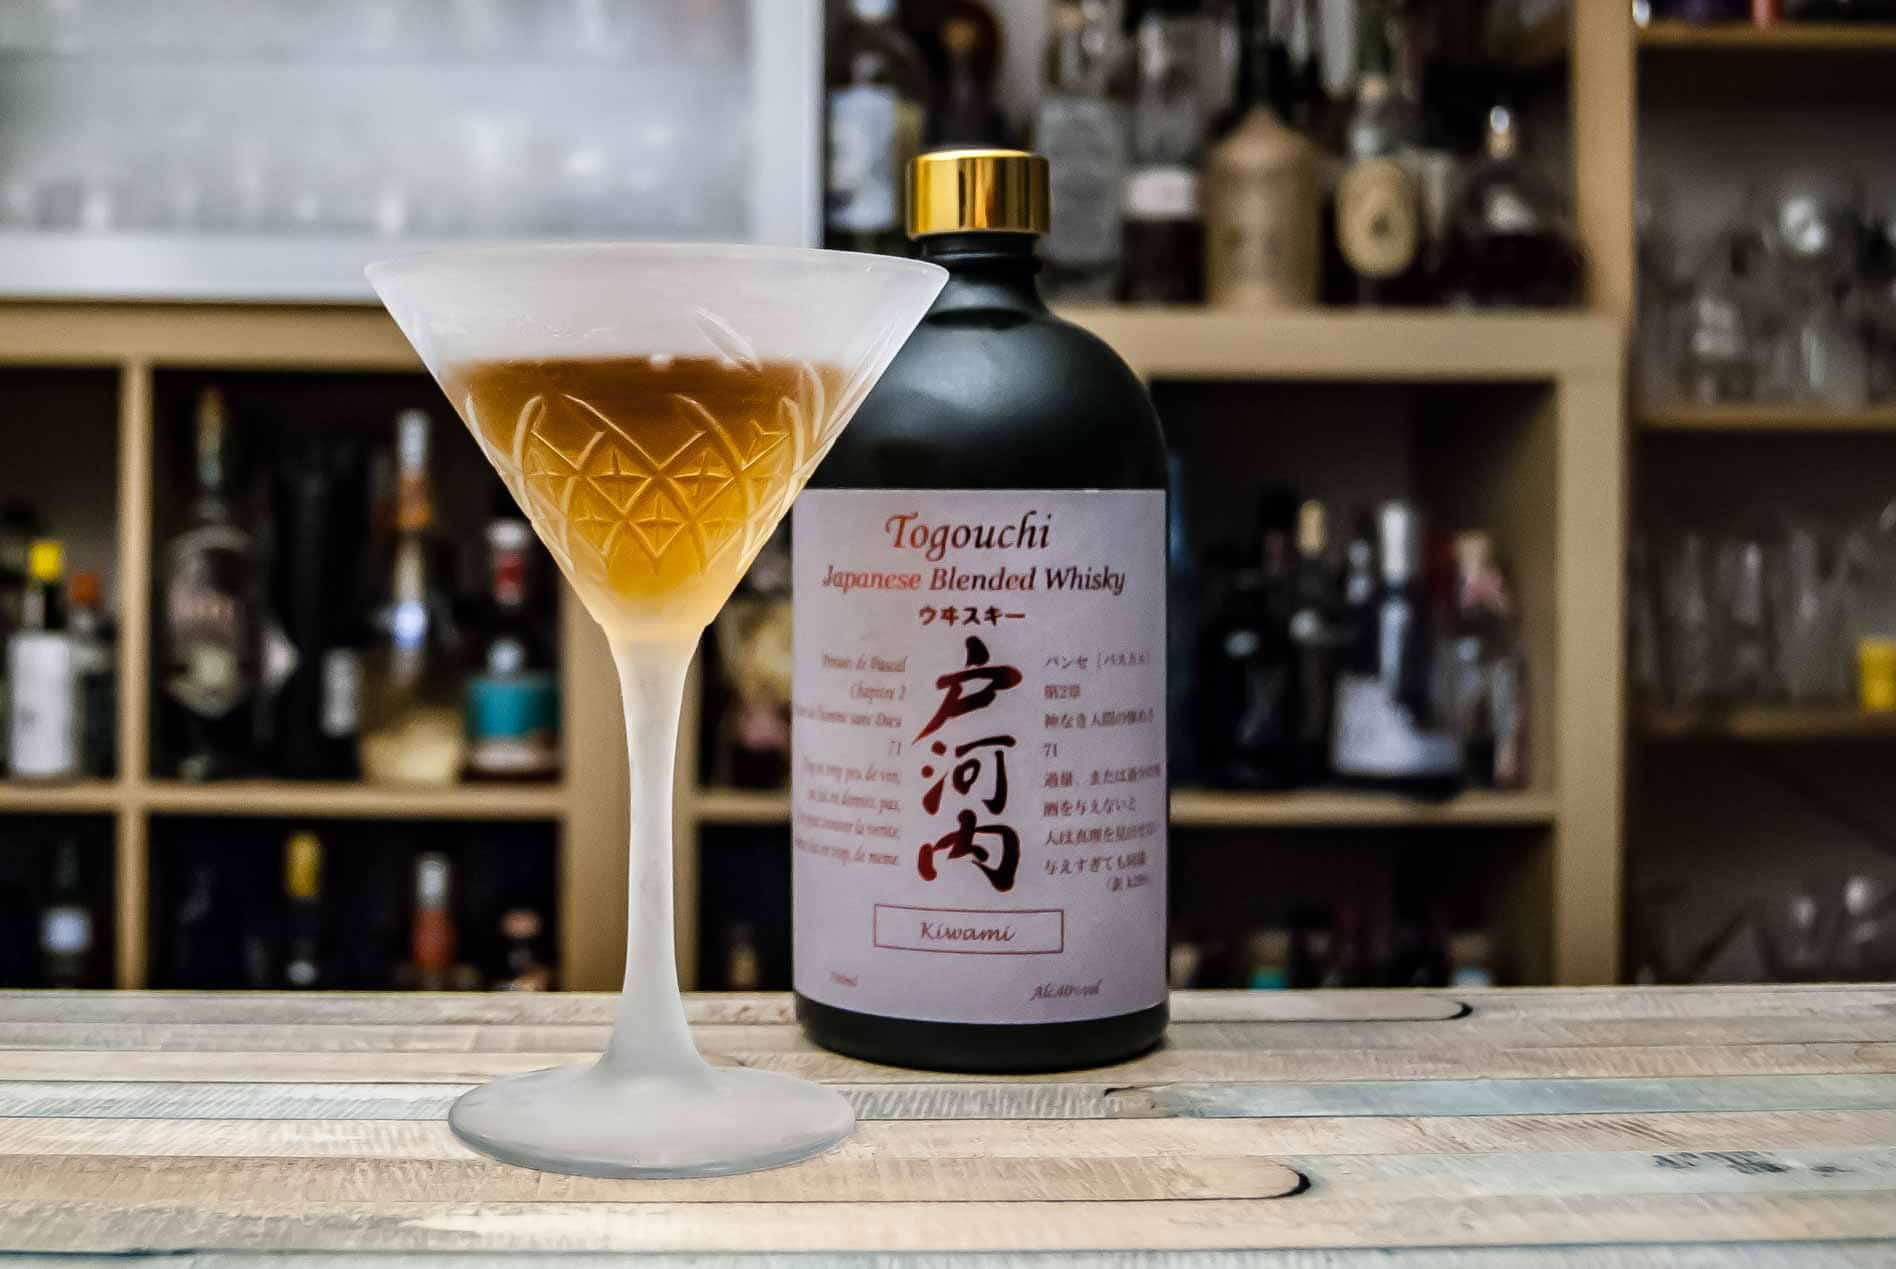 Togouchi Kiwami Japanese Blended Whisky in einem Perfect Manhattan.